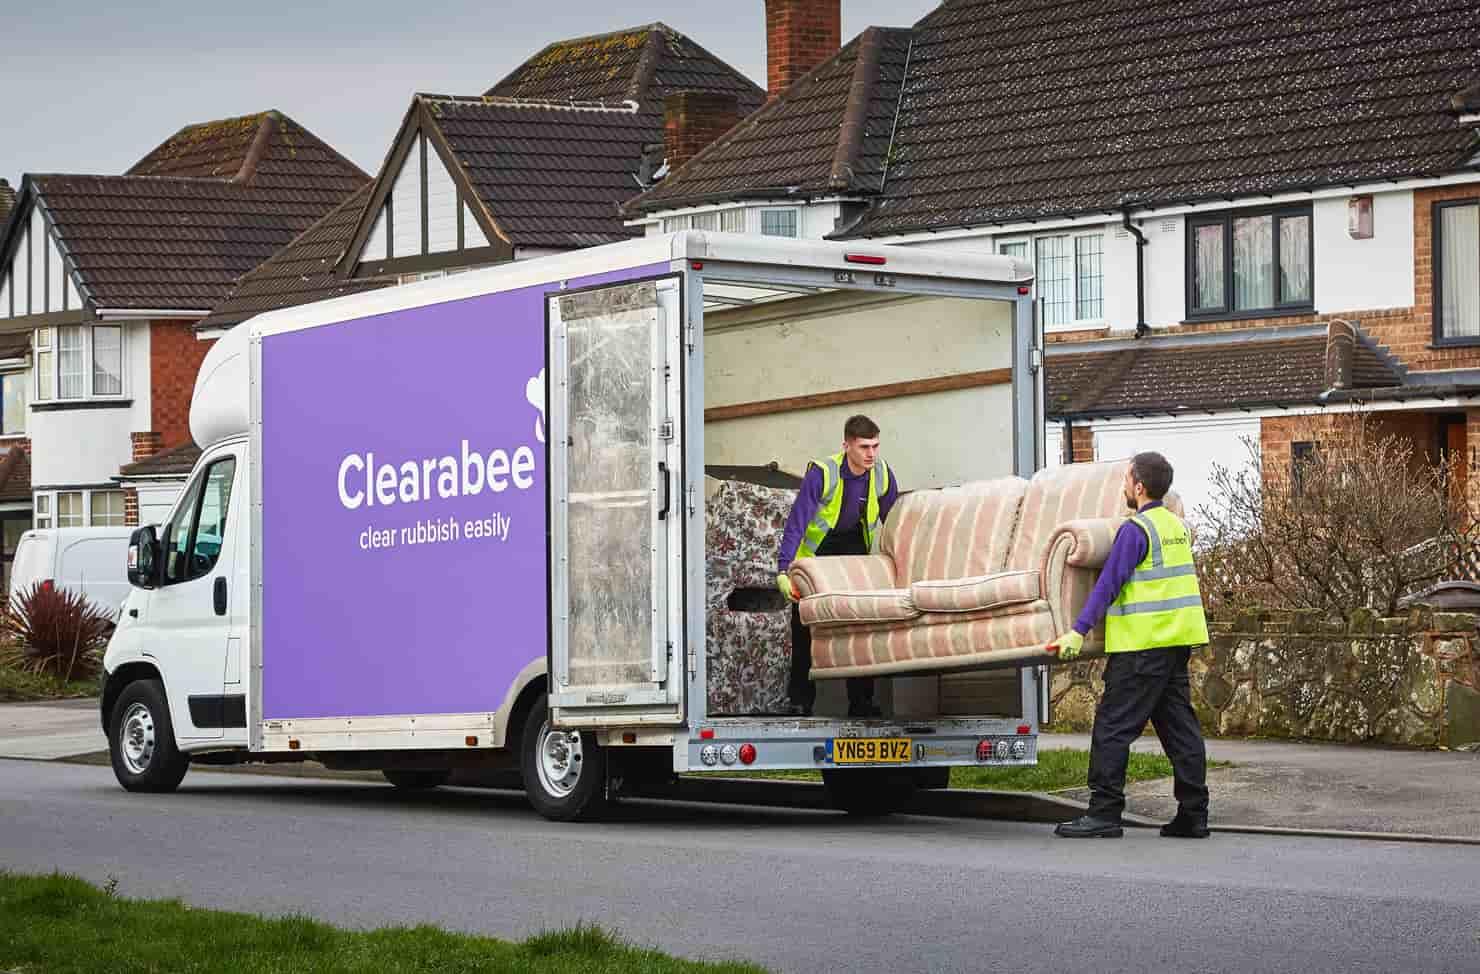 operatives loading a sofa onto a van